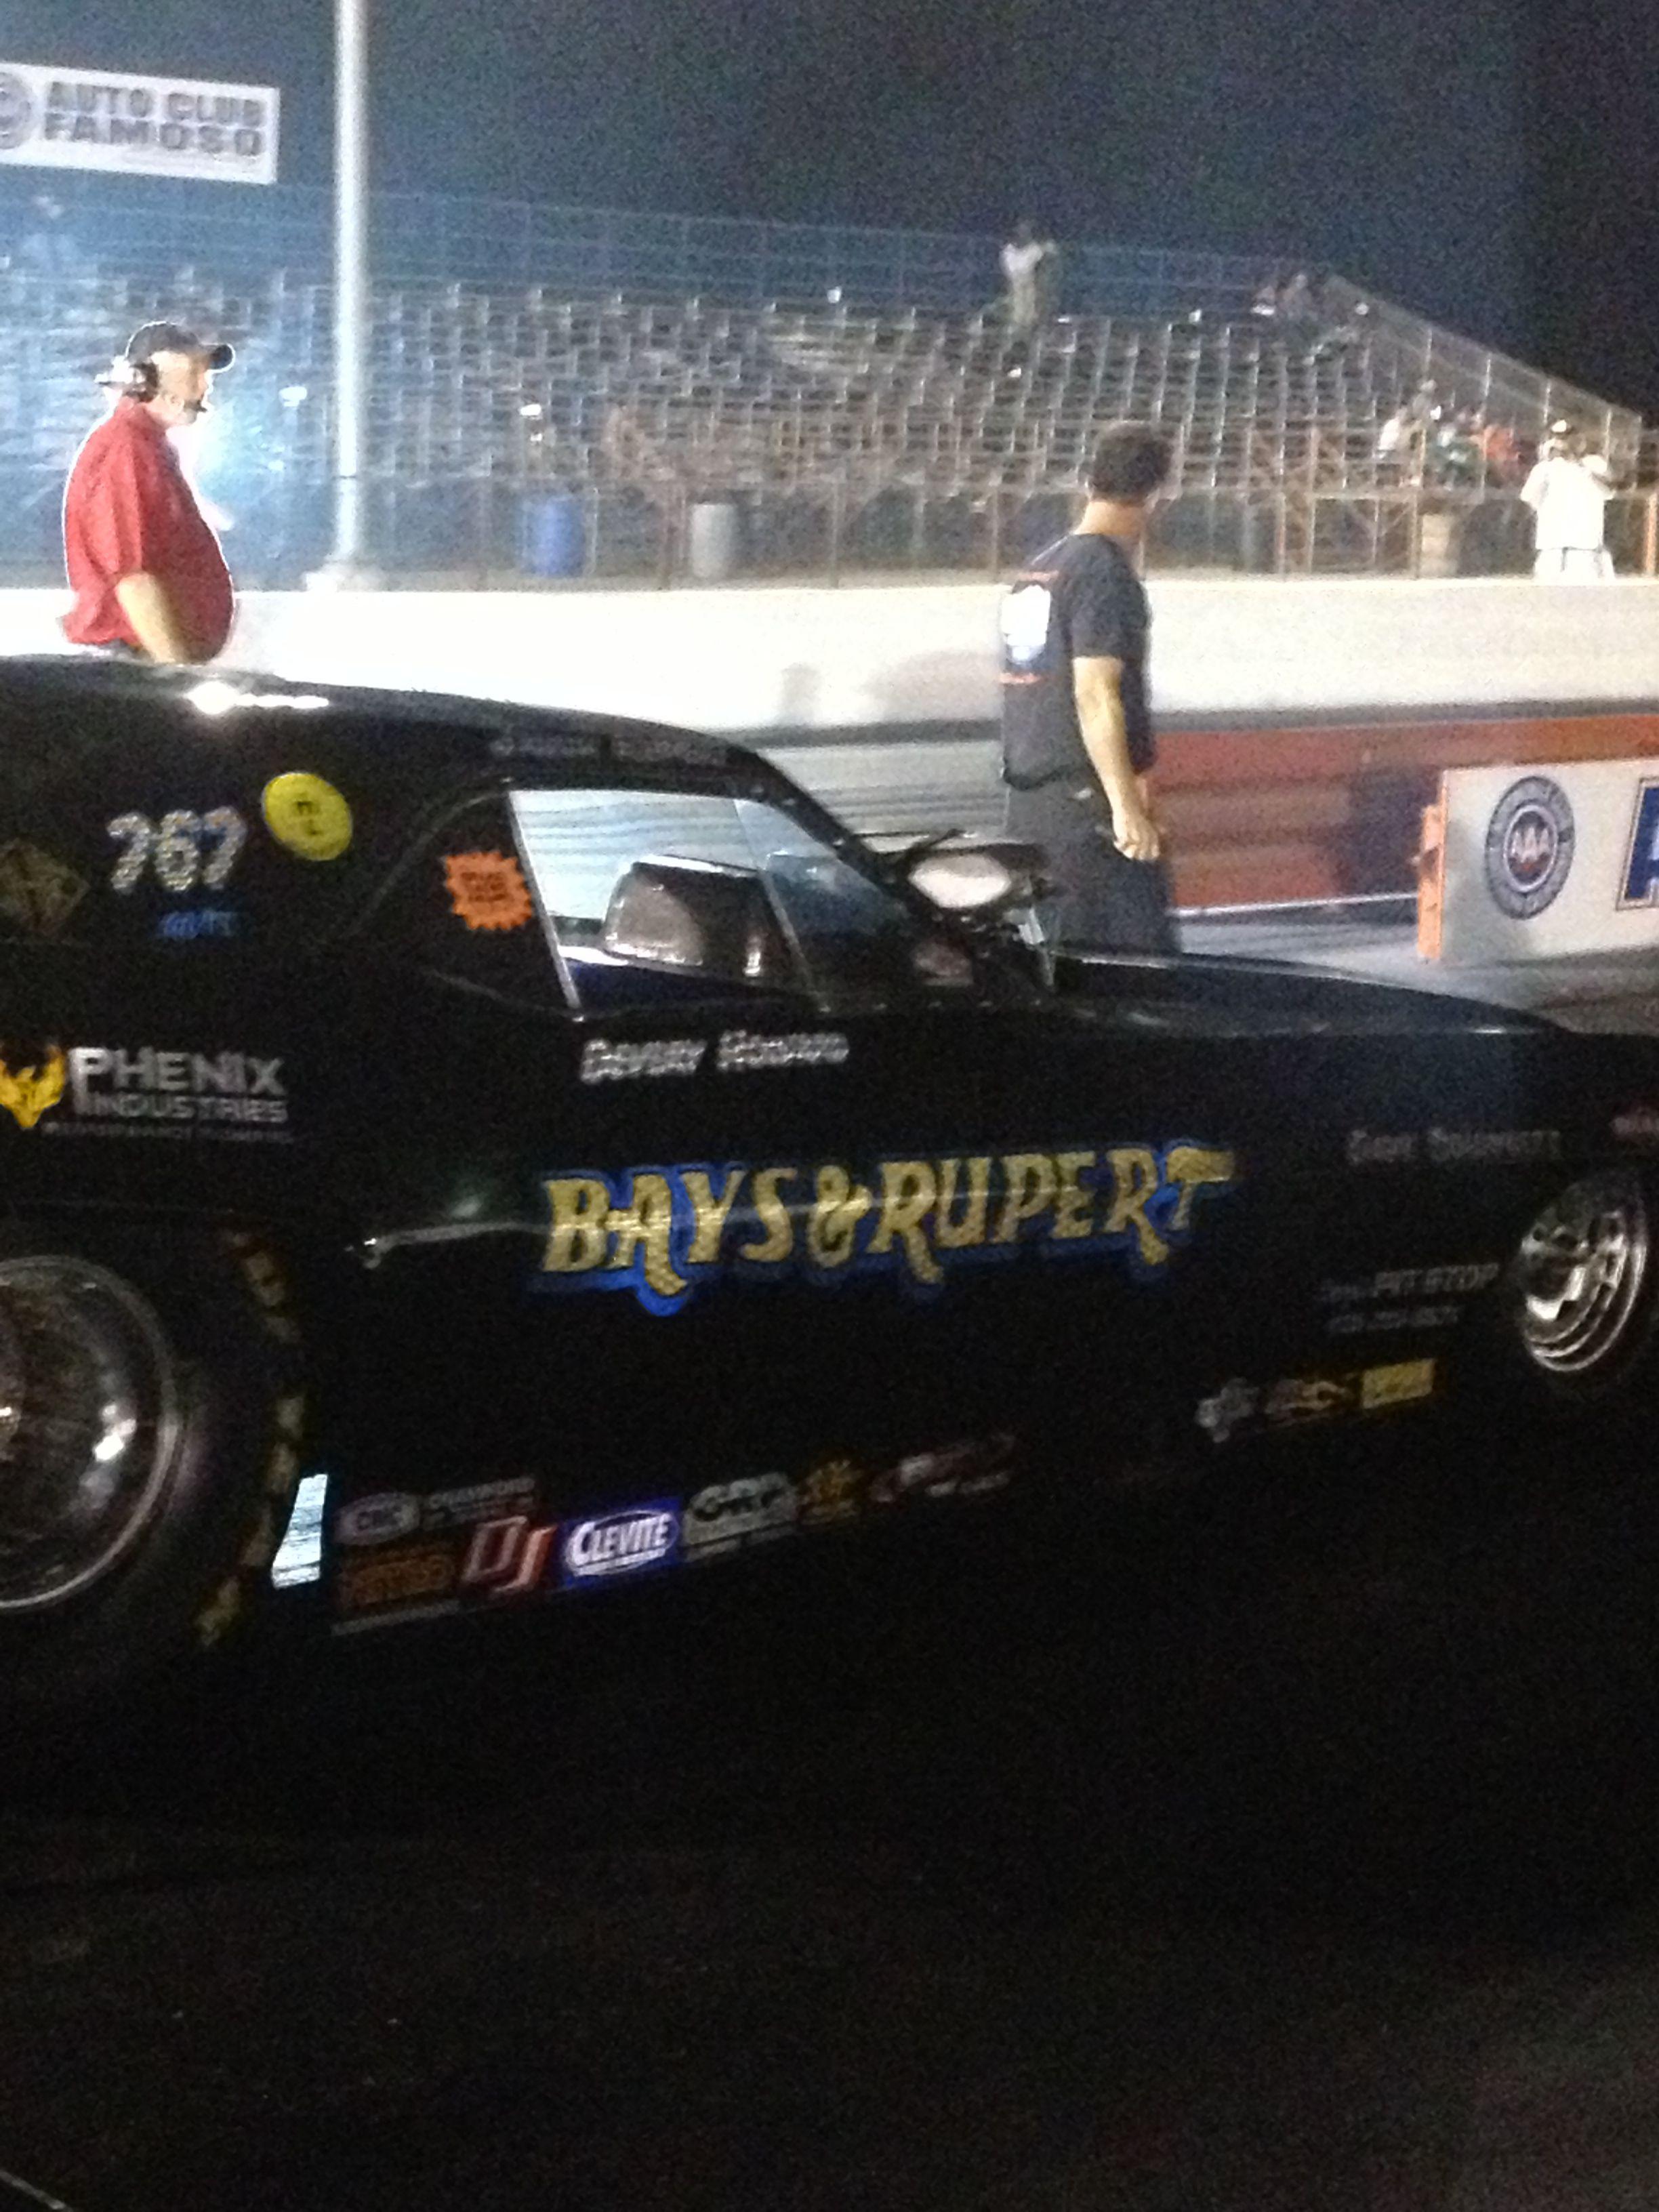 Jason Rupert in the Black Plague Nitro Funny Car @ the 2013 Famoso Nitro Night of Fire #1